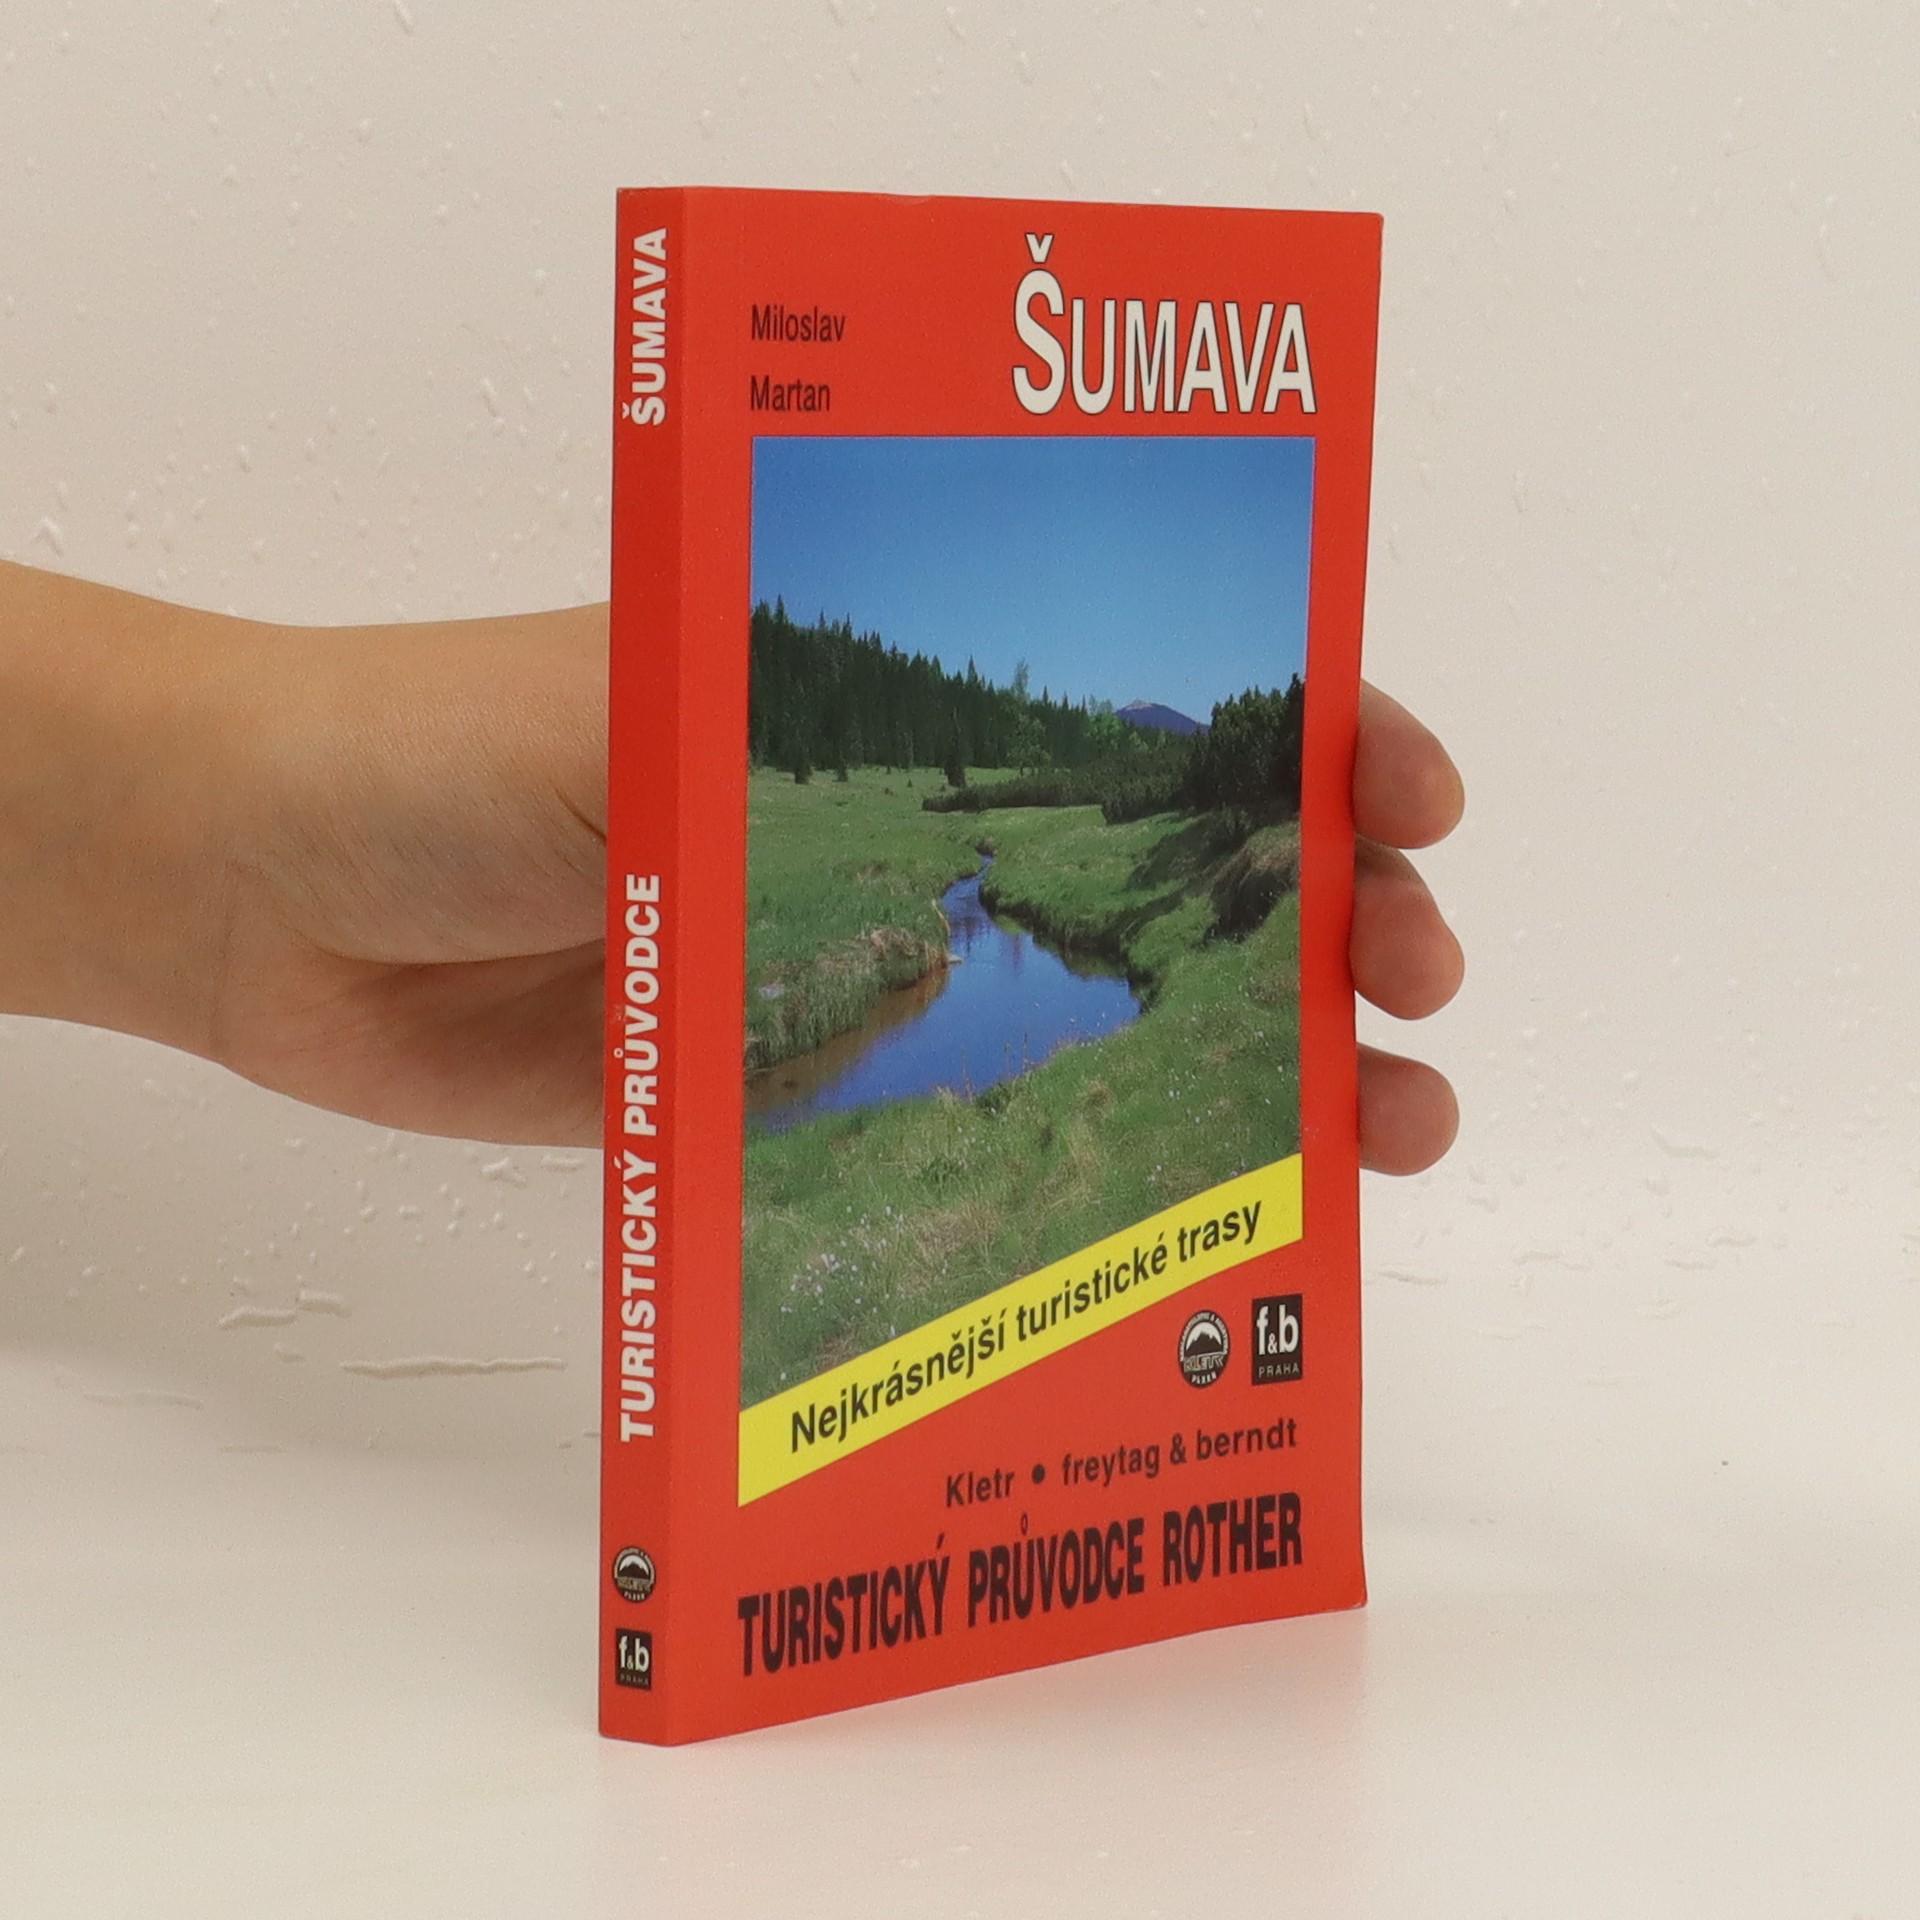 antikvární kniha Šumava, 1997